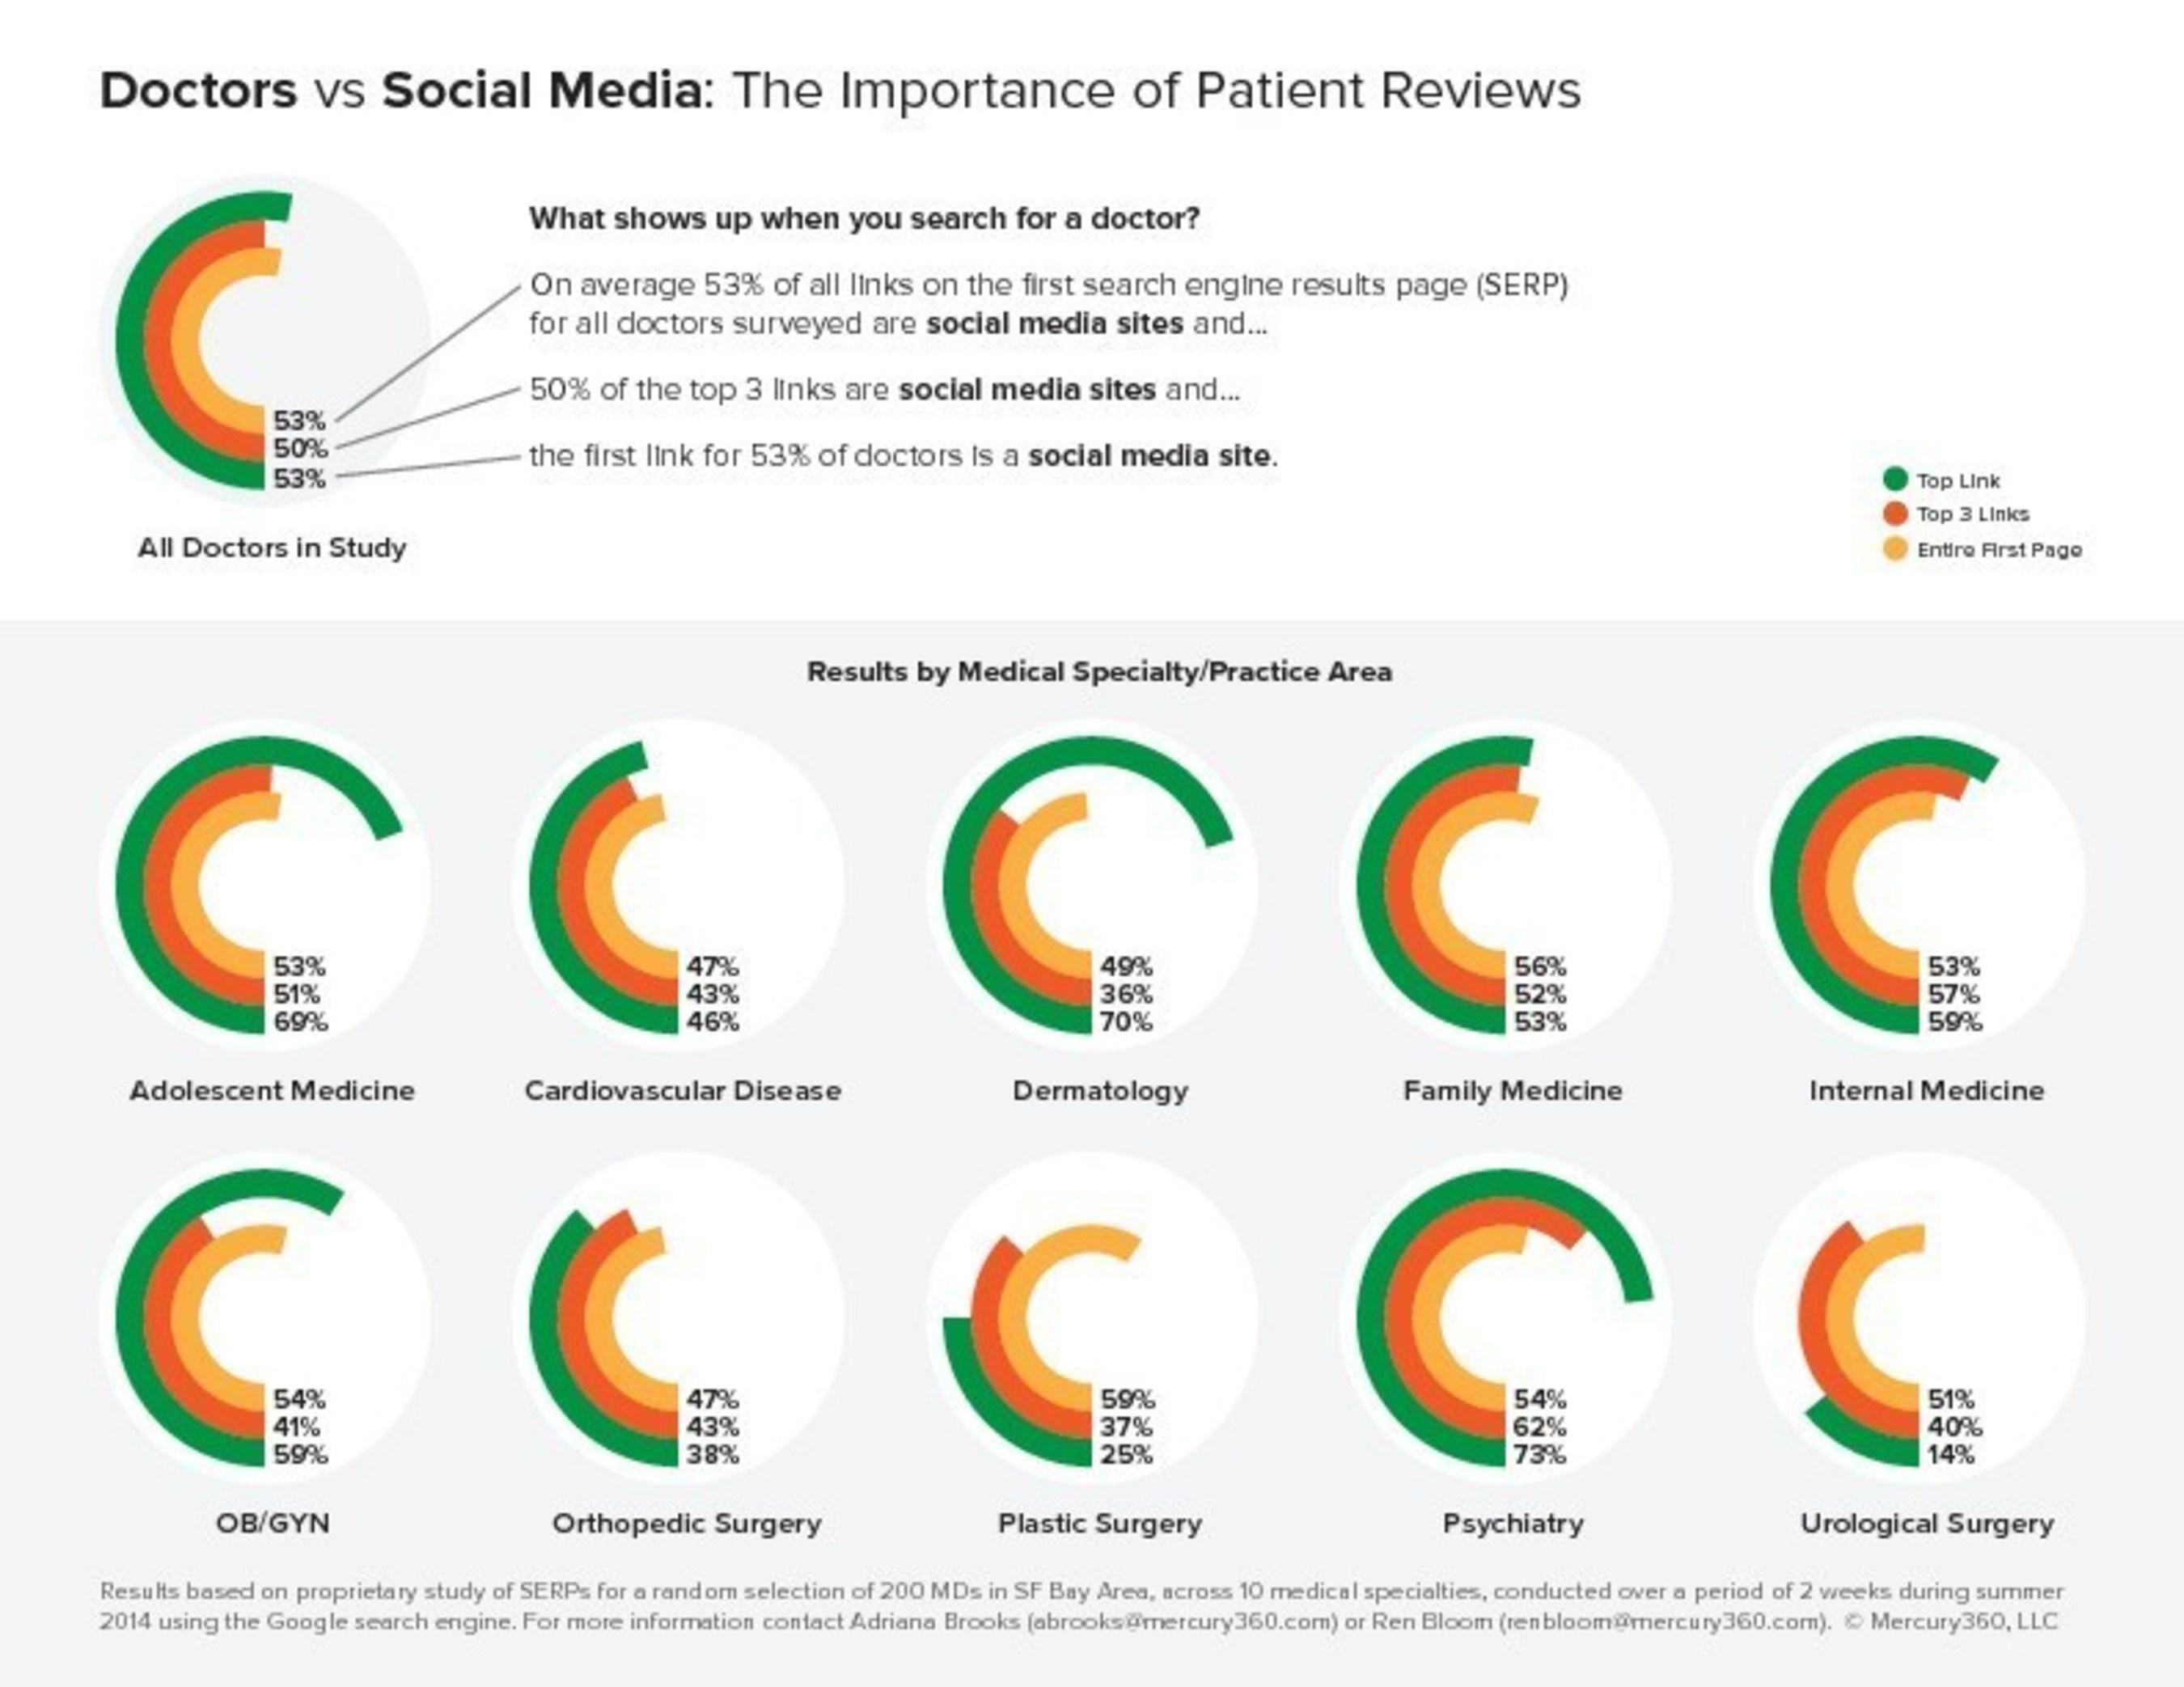 Doctors vs Social Media: The Importance of Patient Reviews